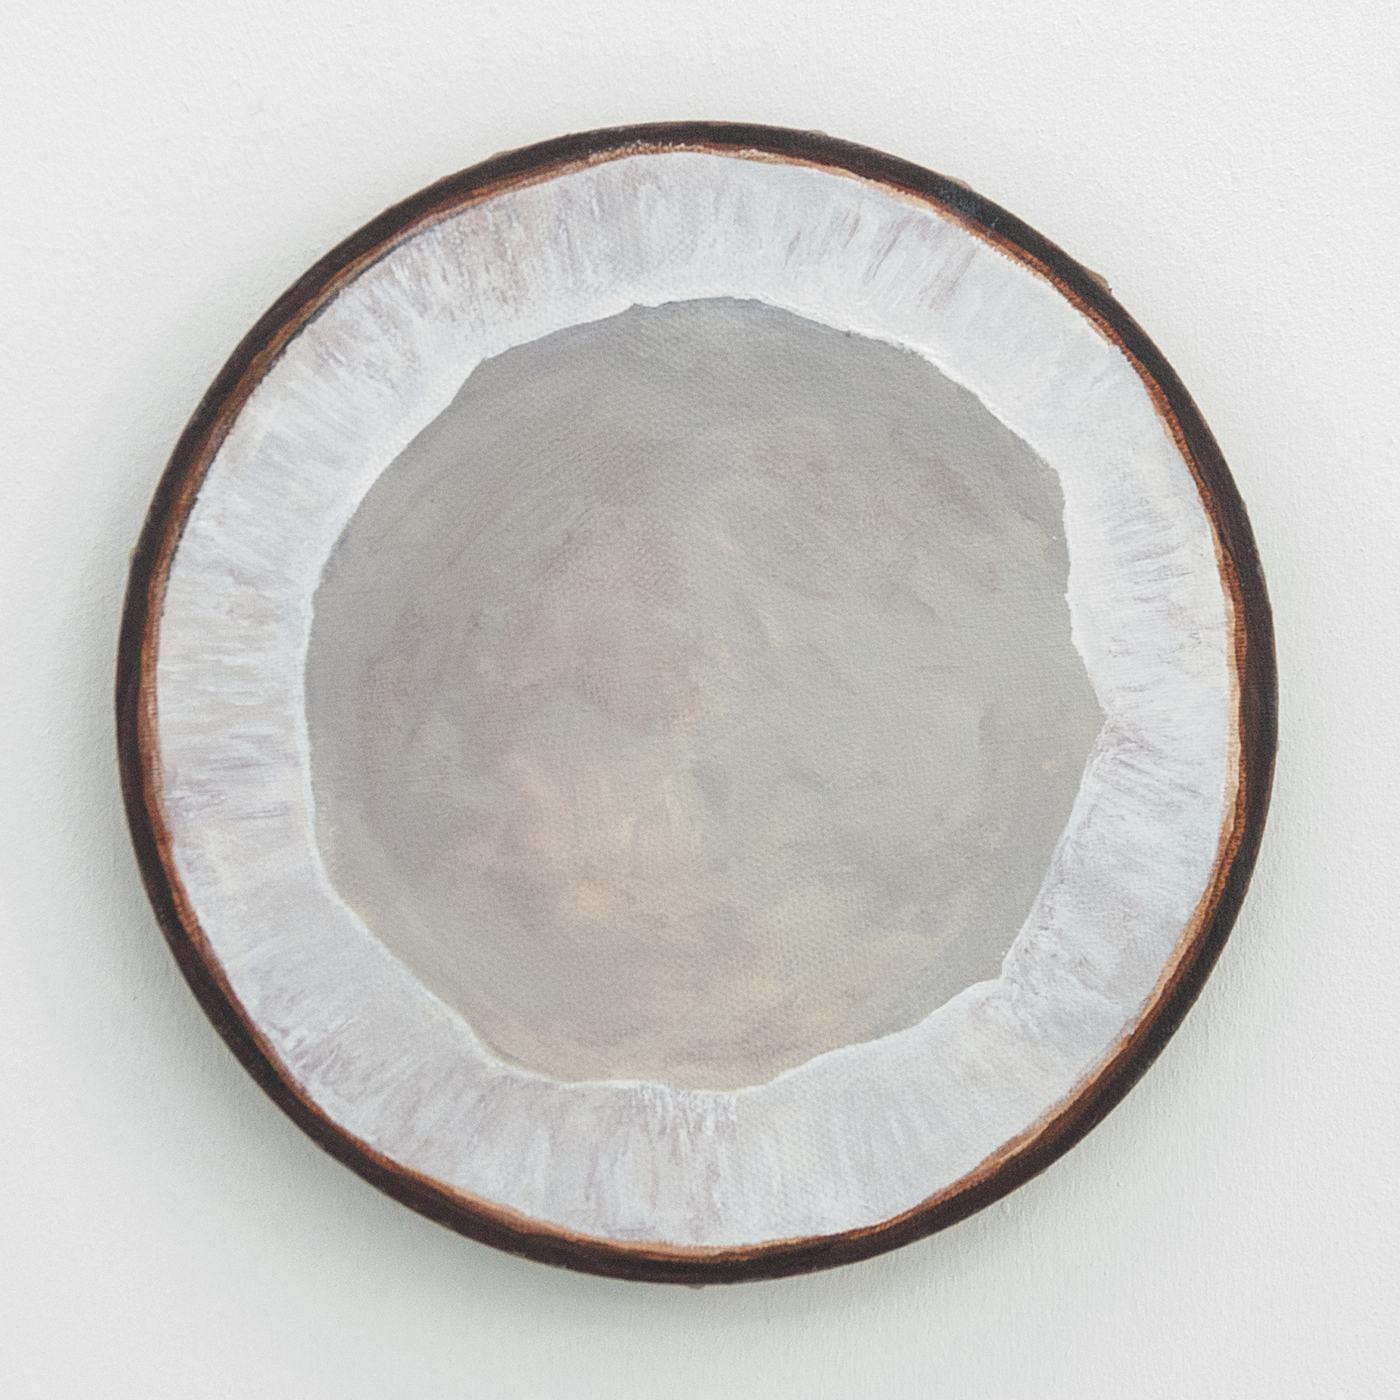 7.Coconut